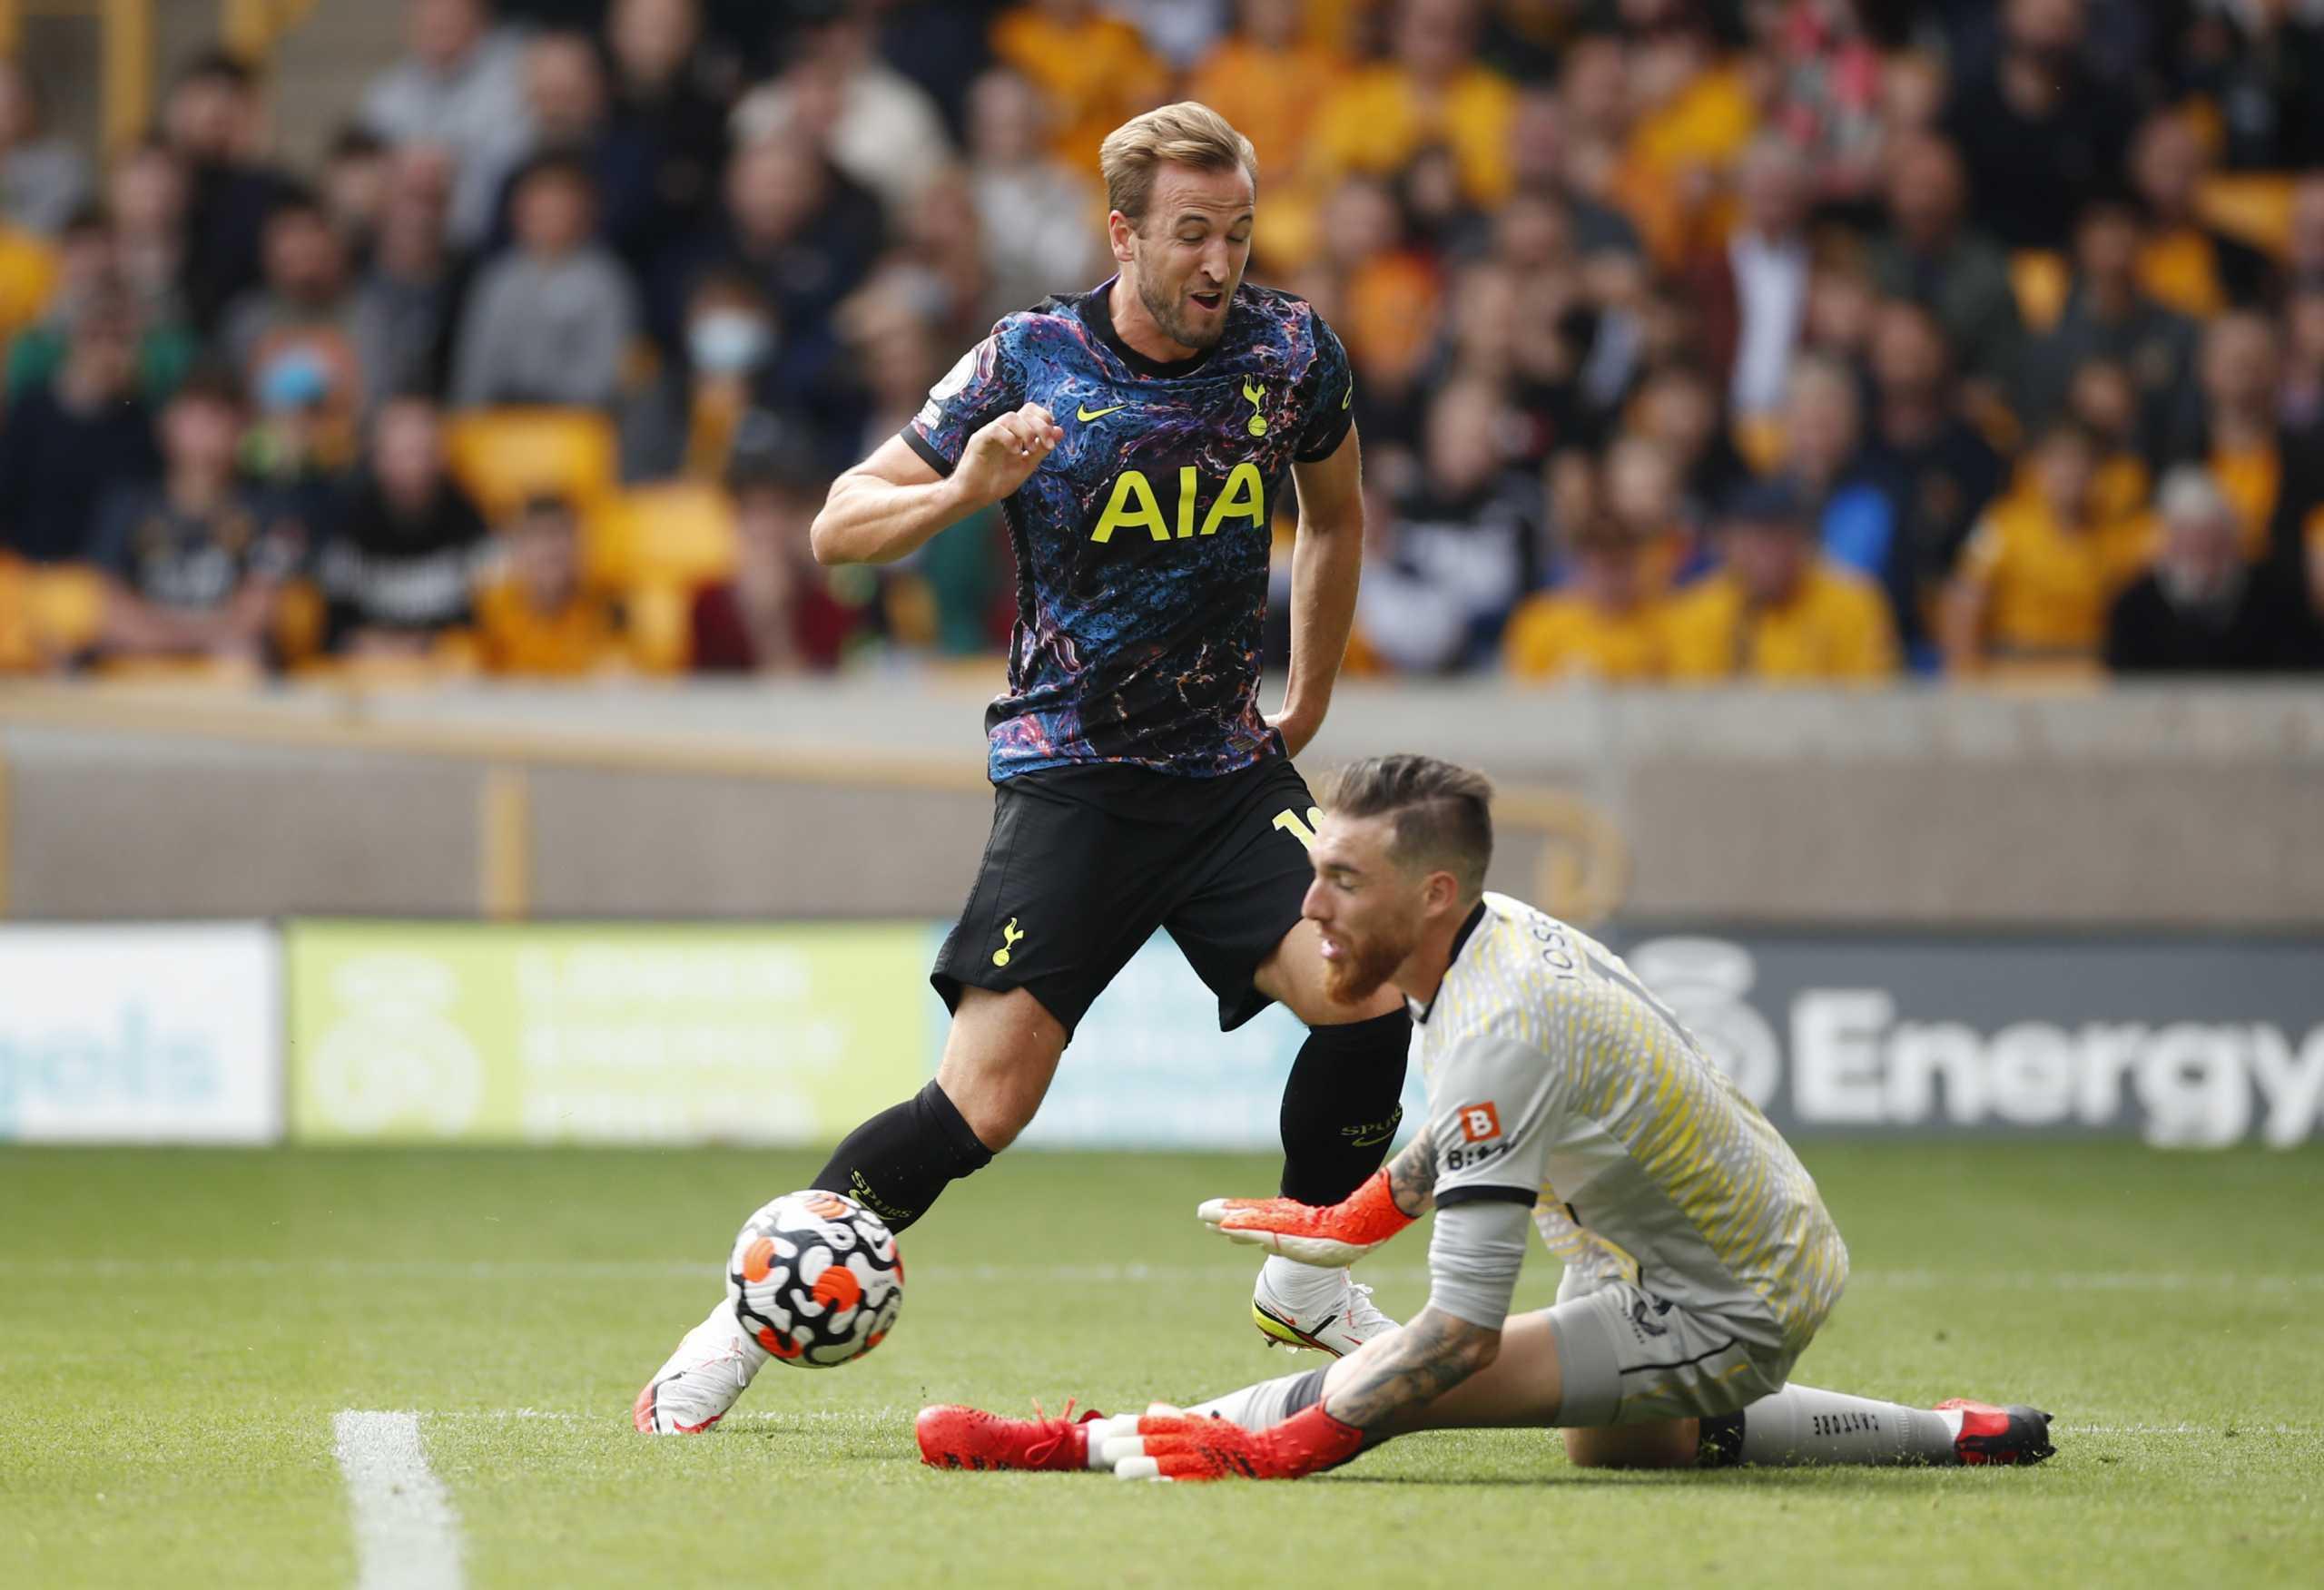 Premier League: Όλες οι επεμβάσεις του Ζοζέ Σα κόντρα στην Τότεναμ